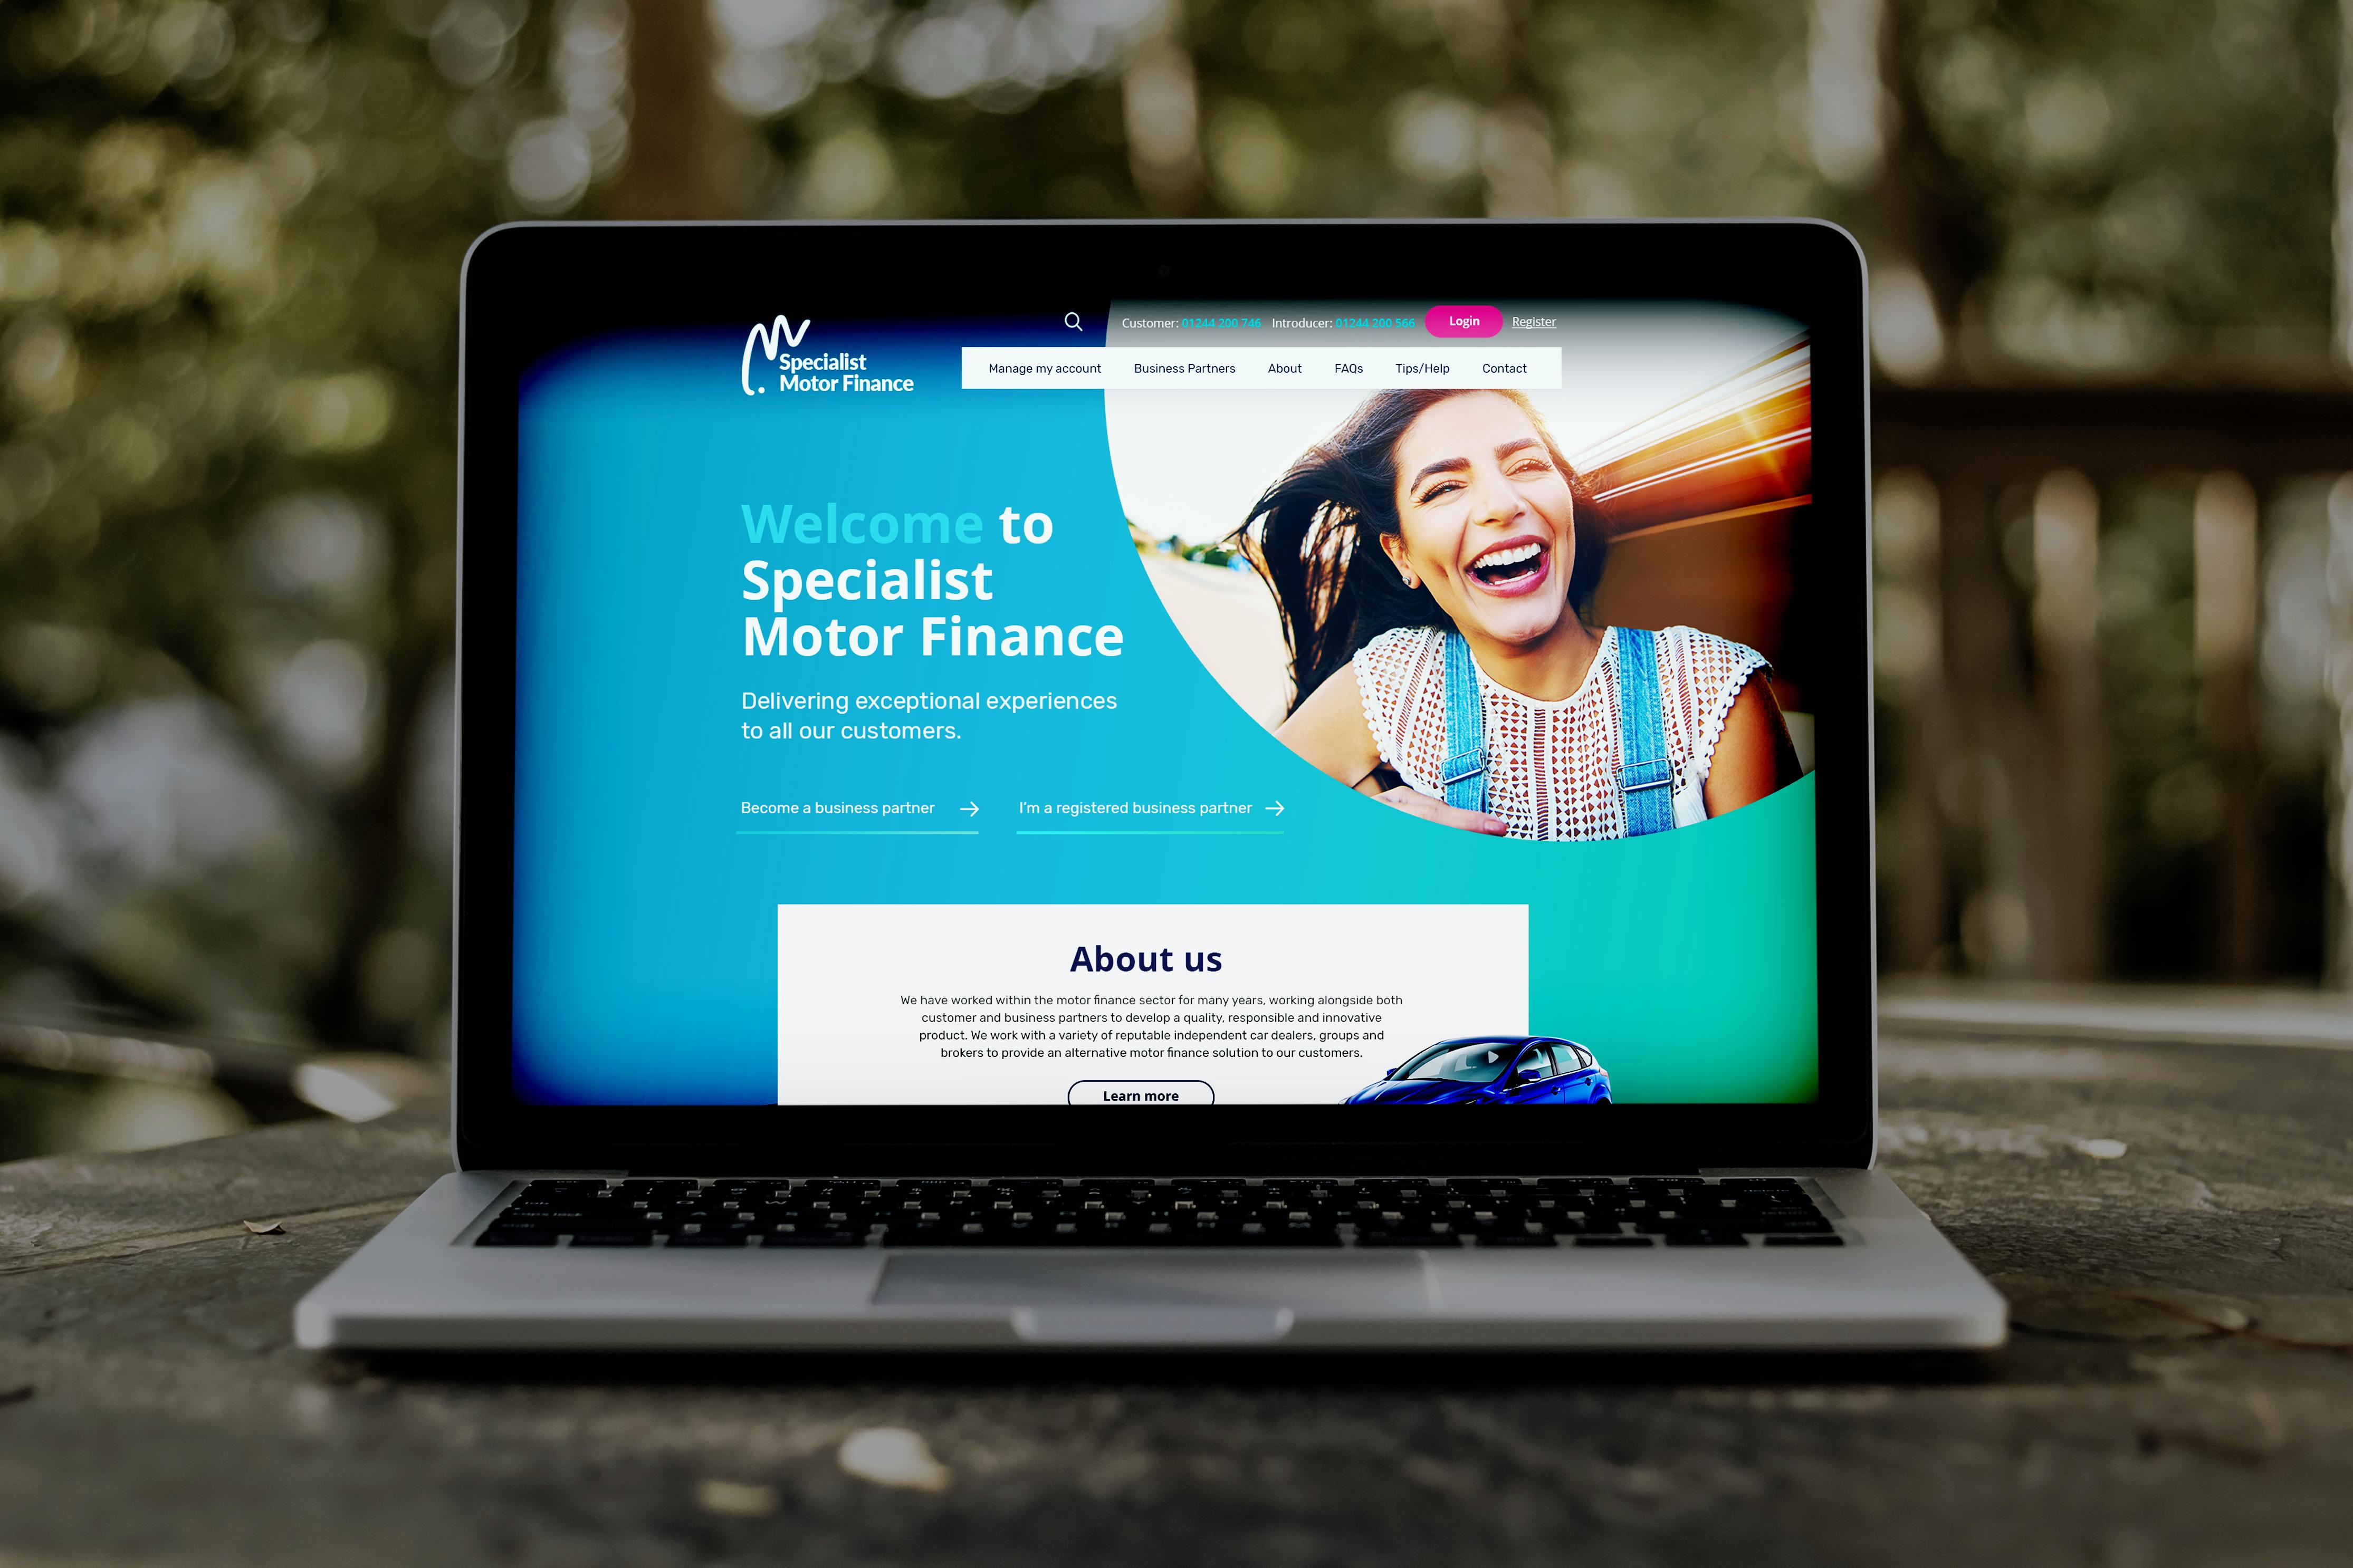 Specialist Motor Finance's new website